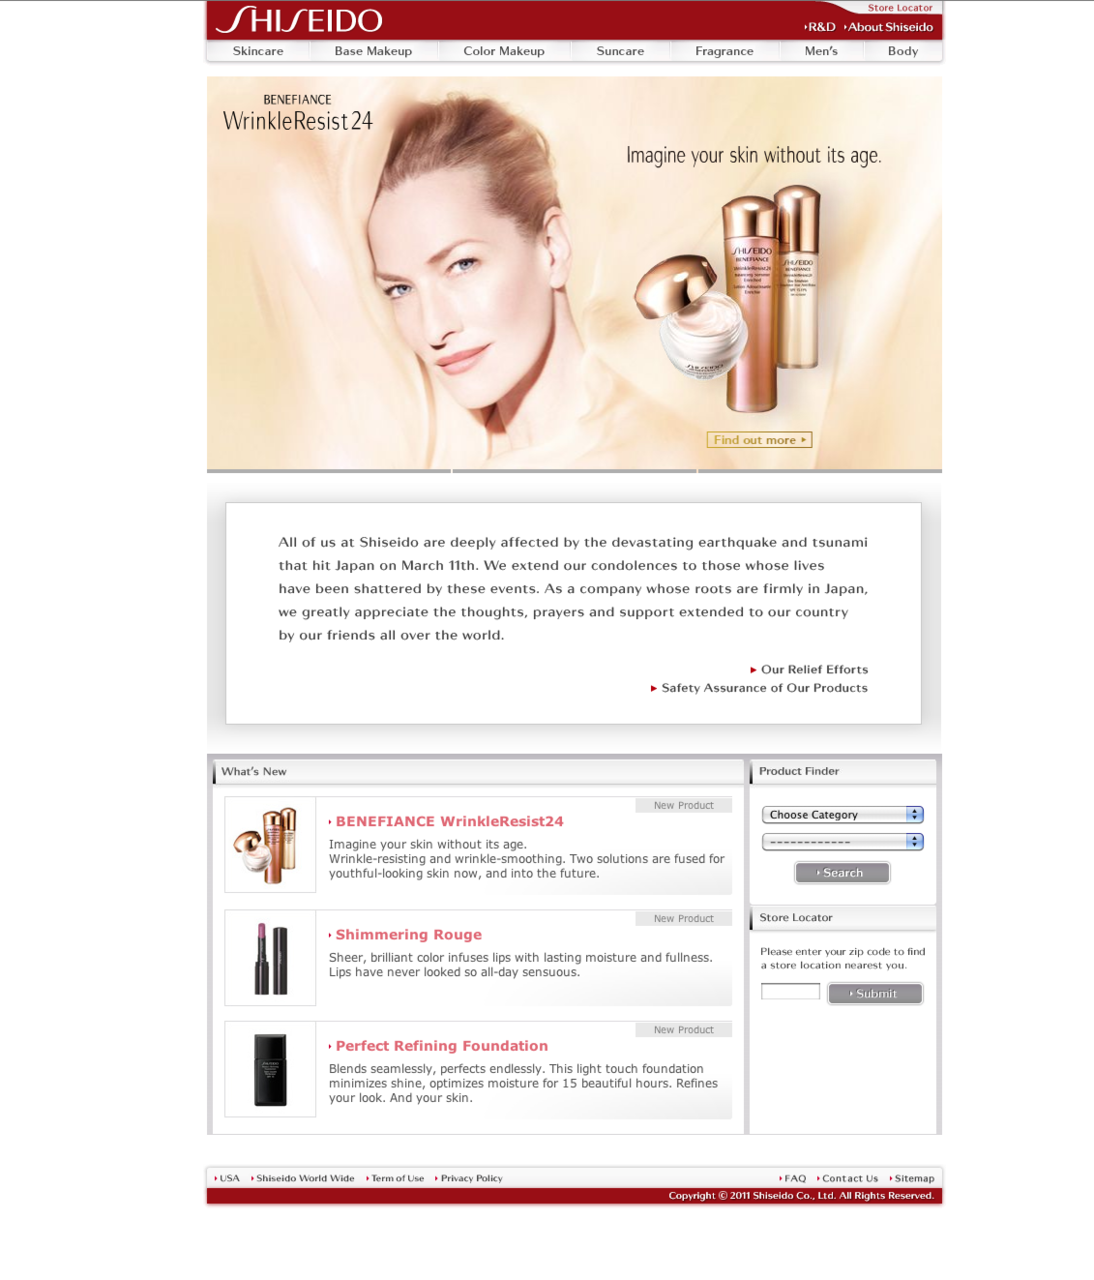 www.shiseido.com